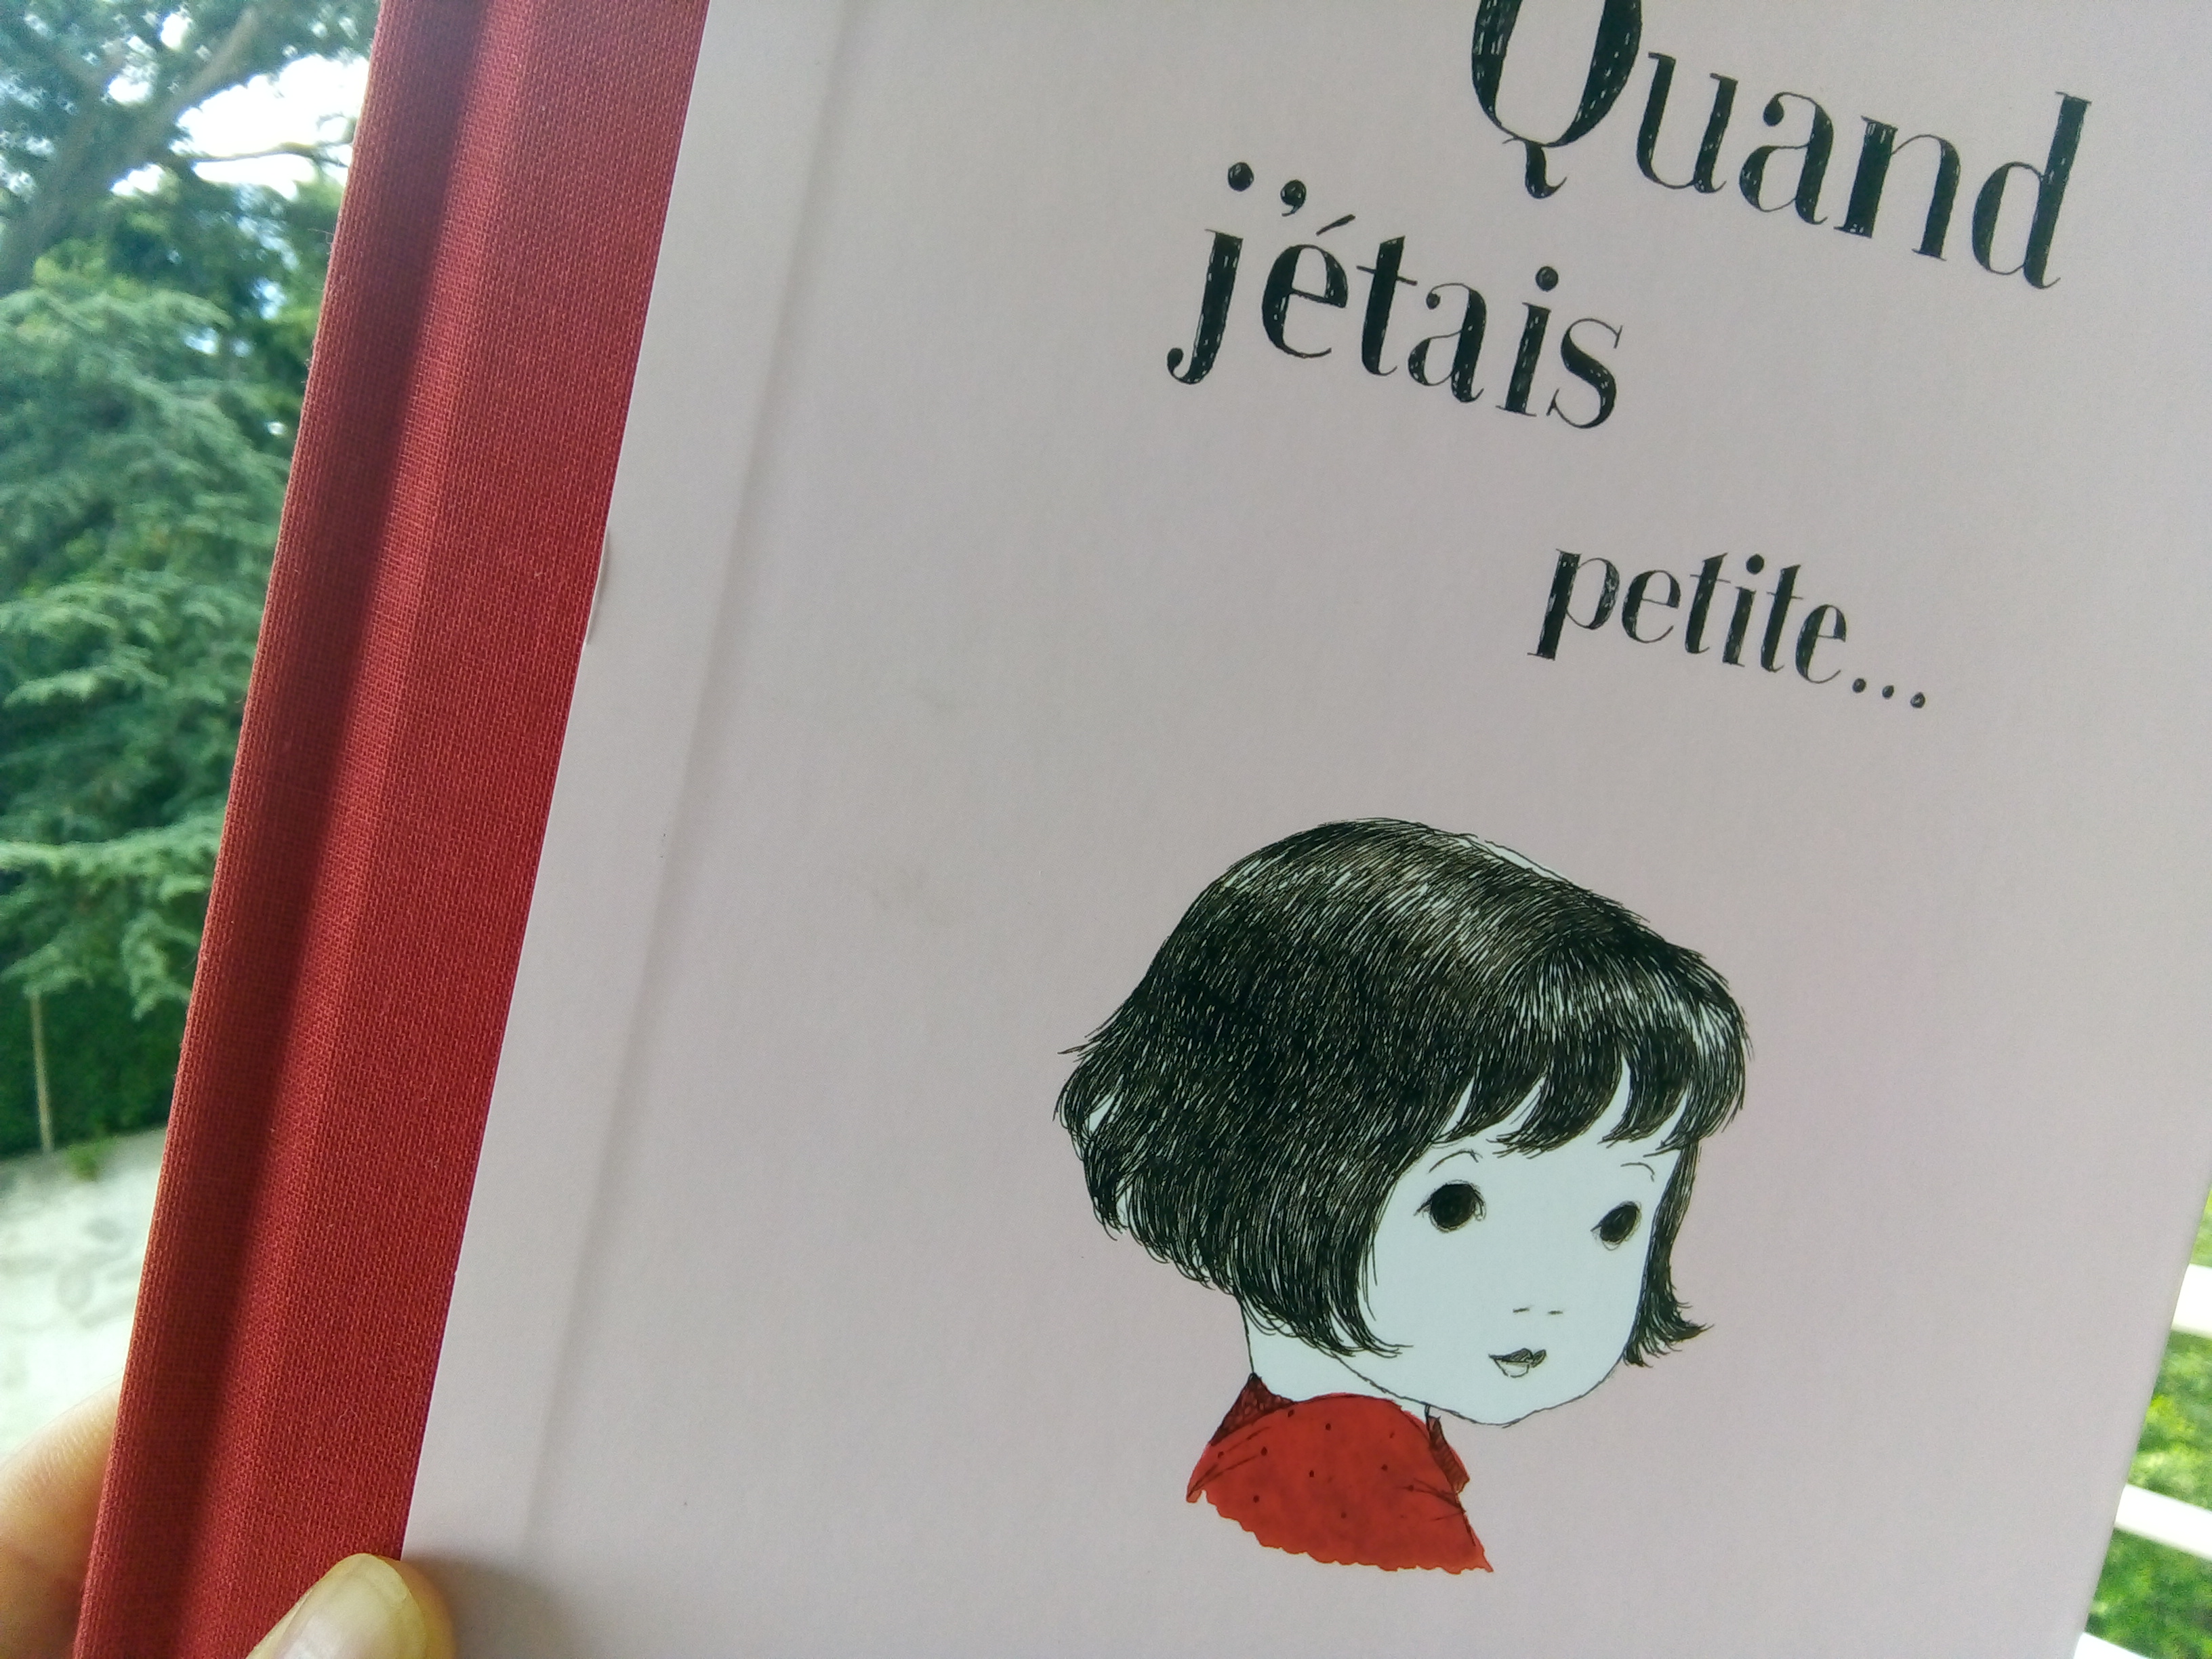 livre enfant quand j etais petite